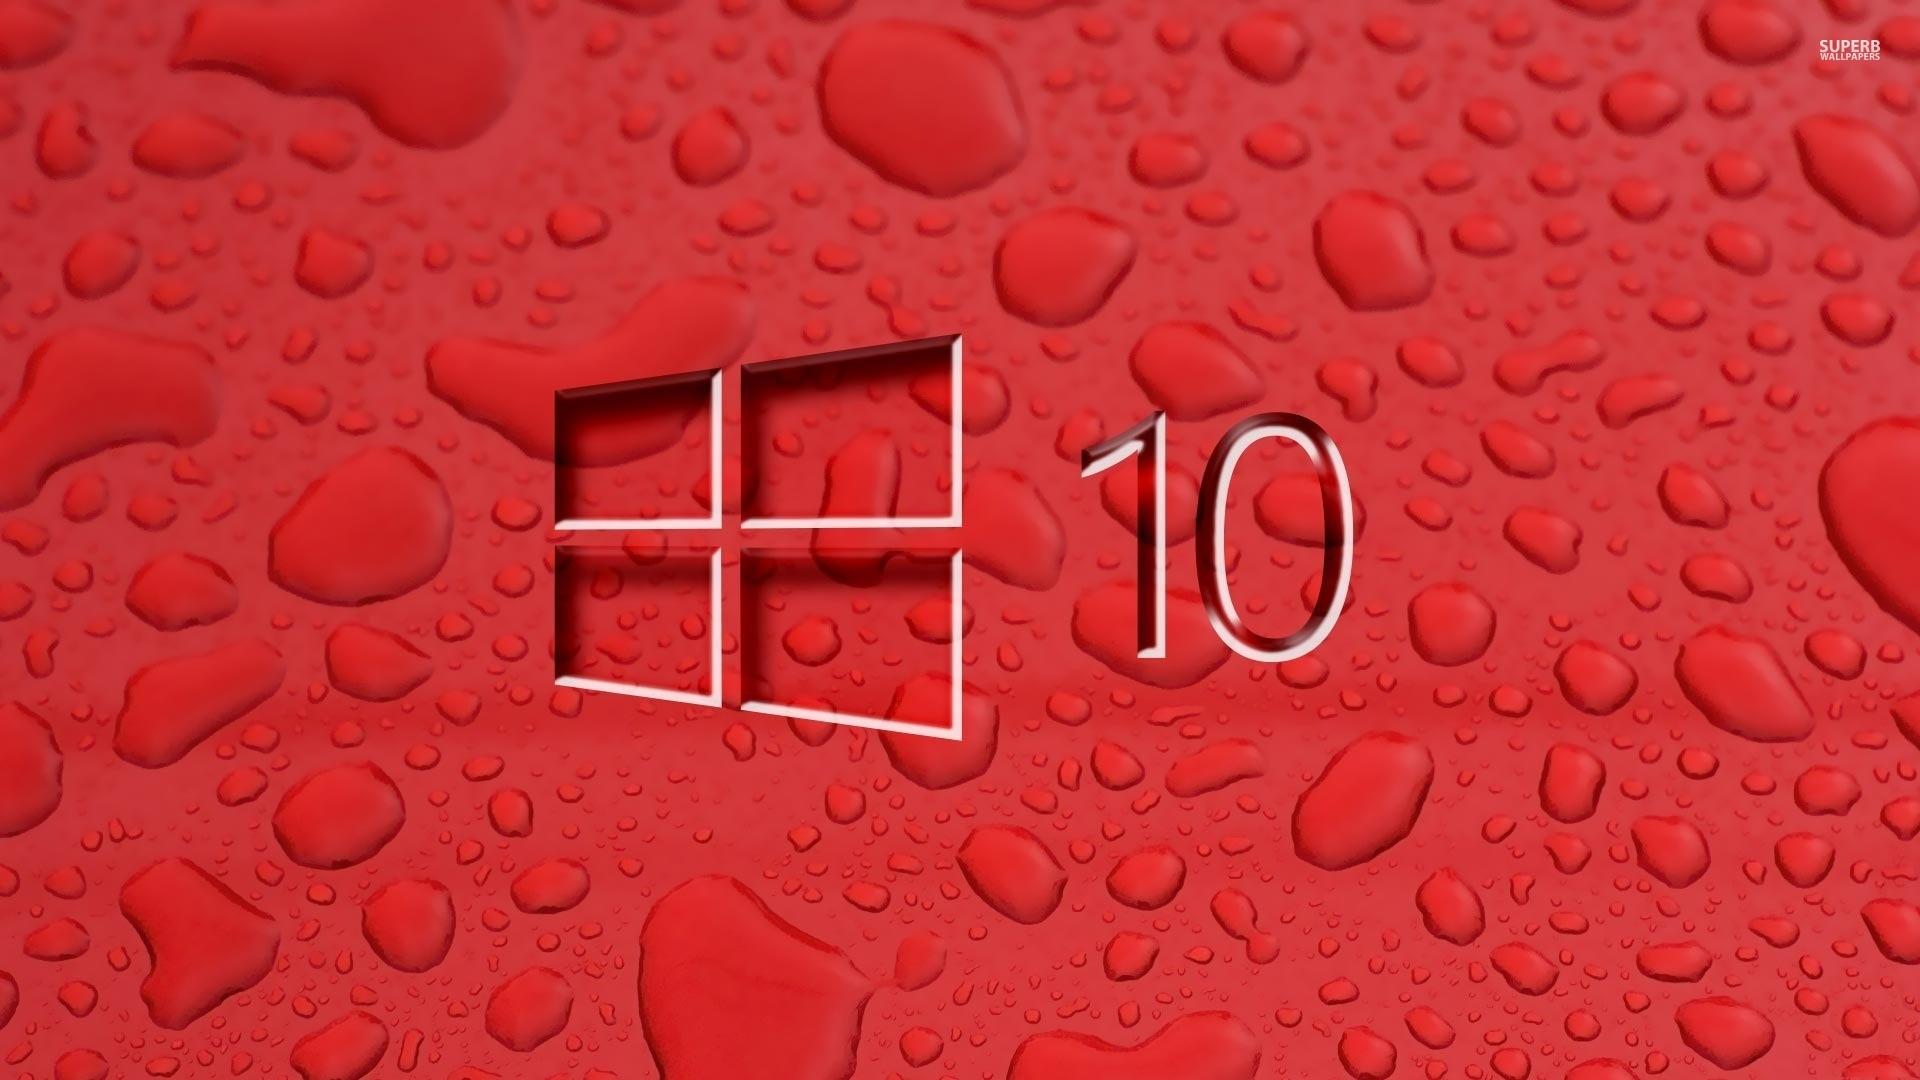 New Windows 10 Desktop Background